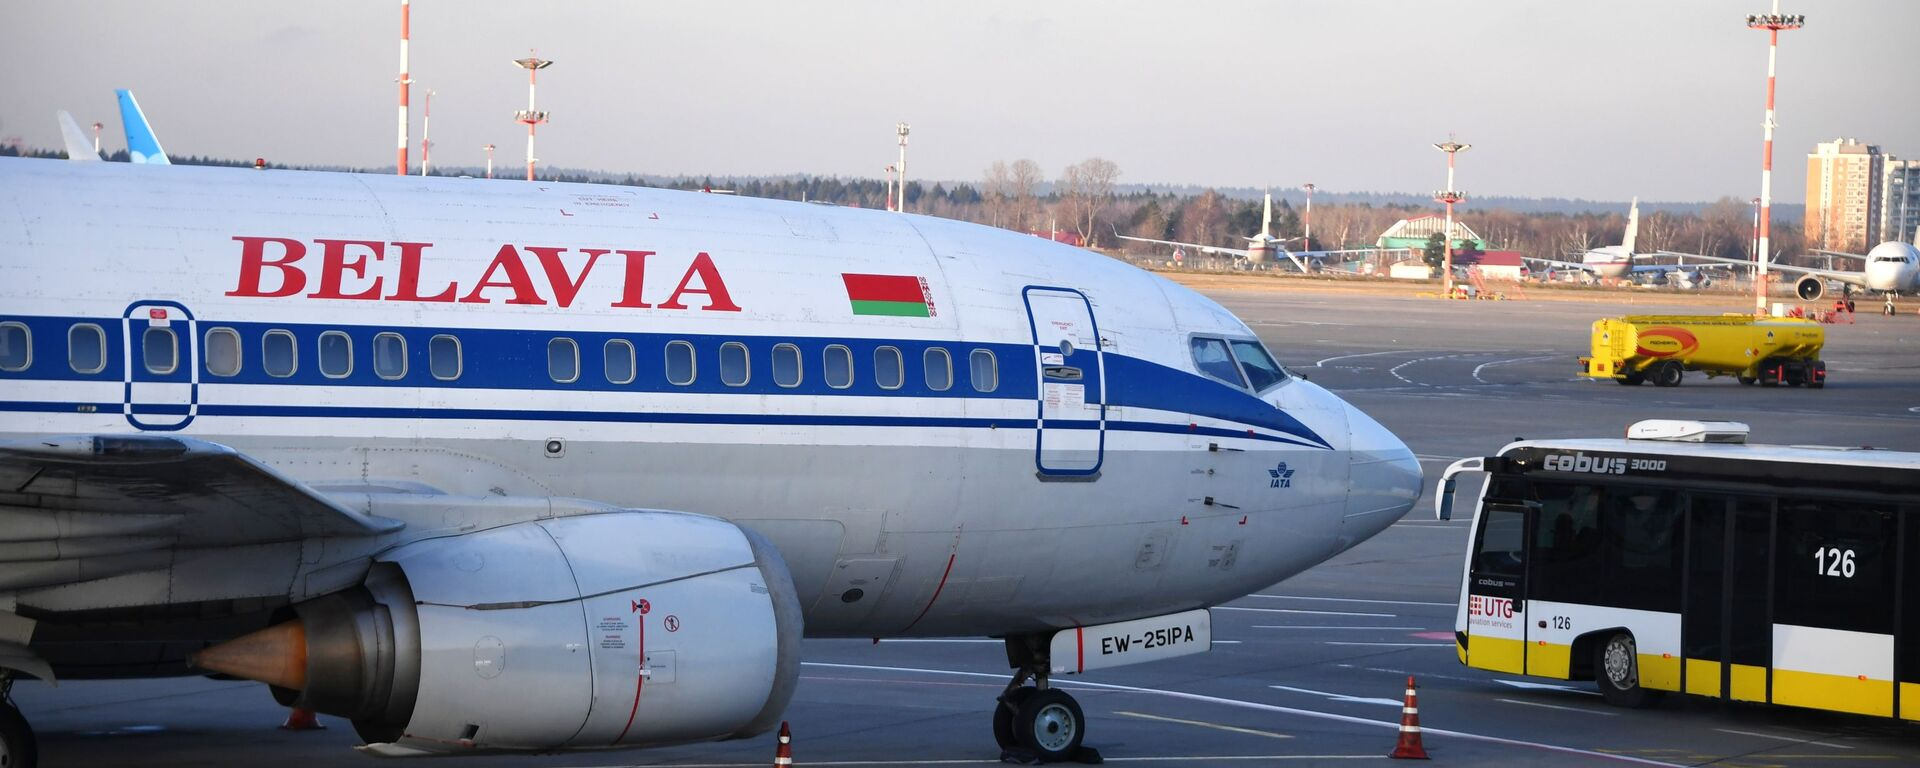 Самолет Boeing 737-500 авиакомпании Белавиа в международном аэропорту Внуково - Sputnik Беларусь, 1920, 16.02.2021